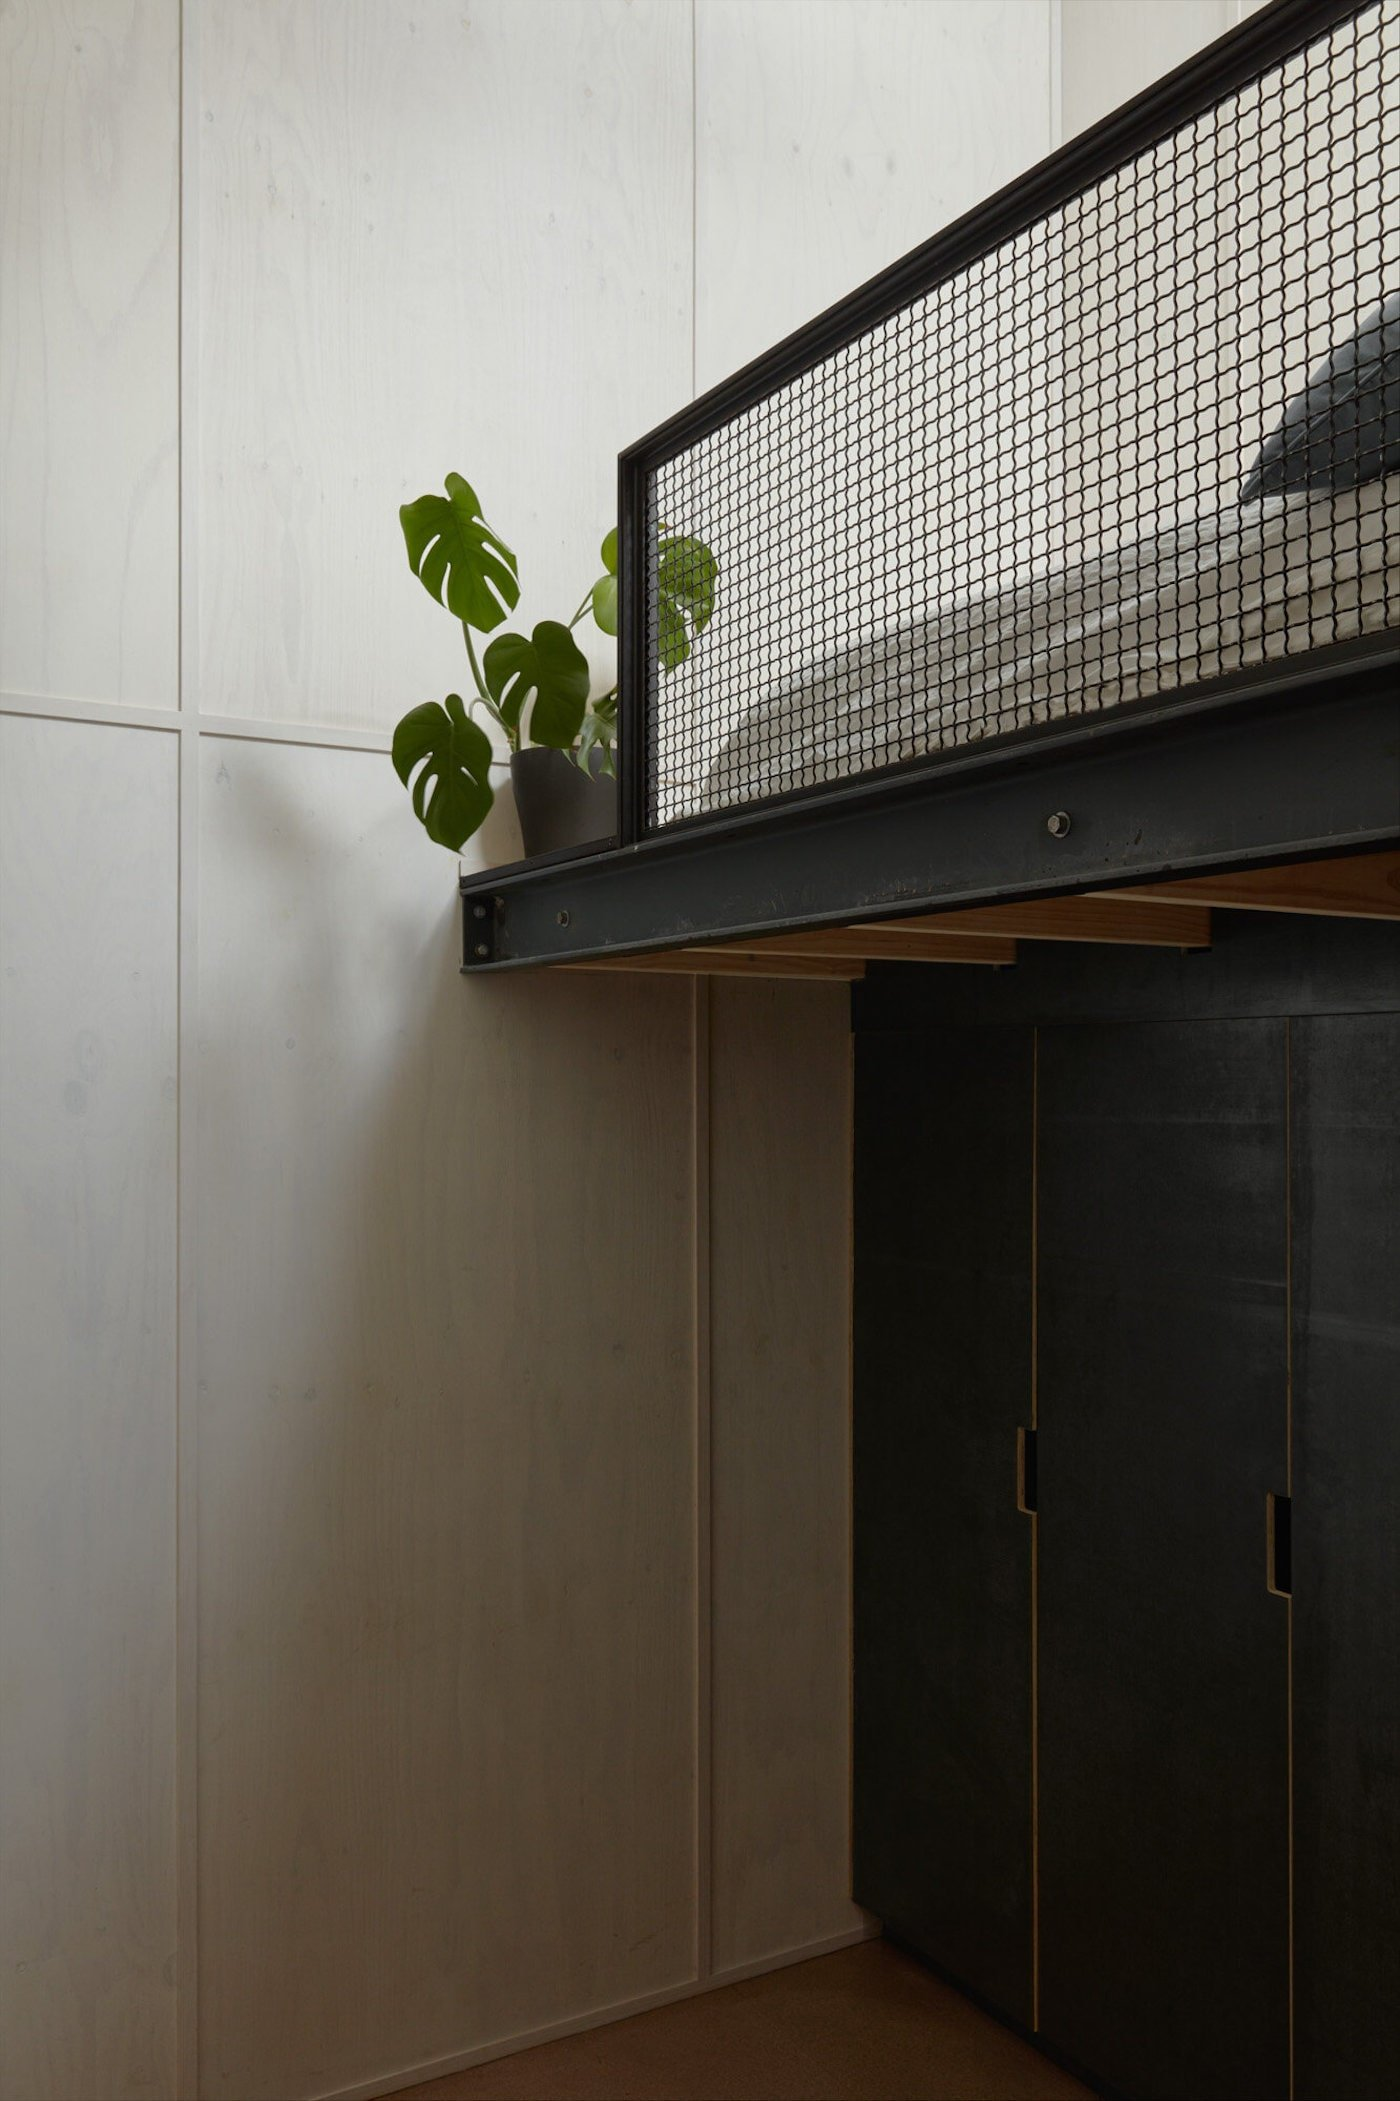 Eco Edition_Breathe Architecture_Warehouse Greenhouse_Architecture sustainability 8-min